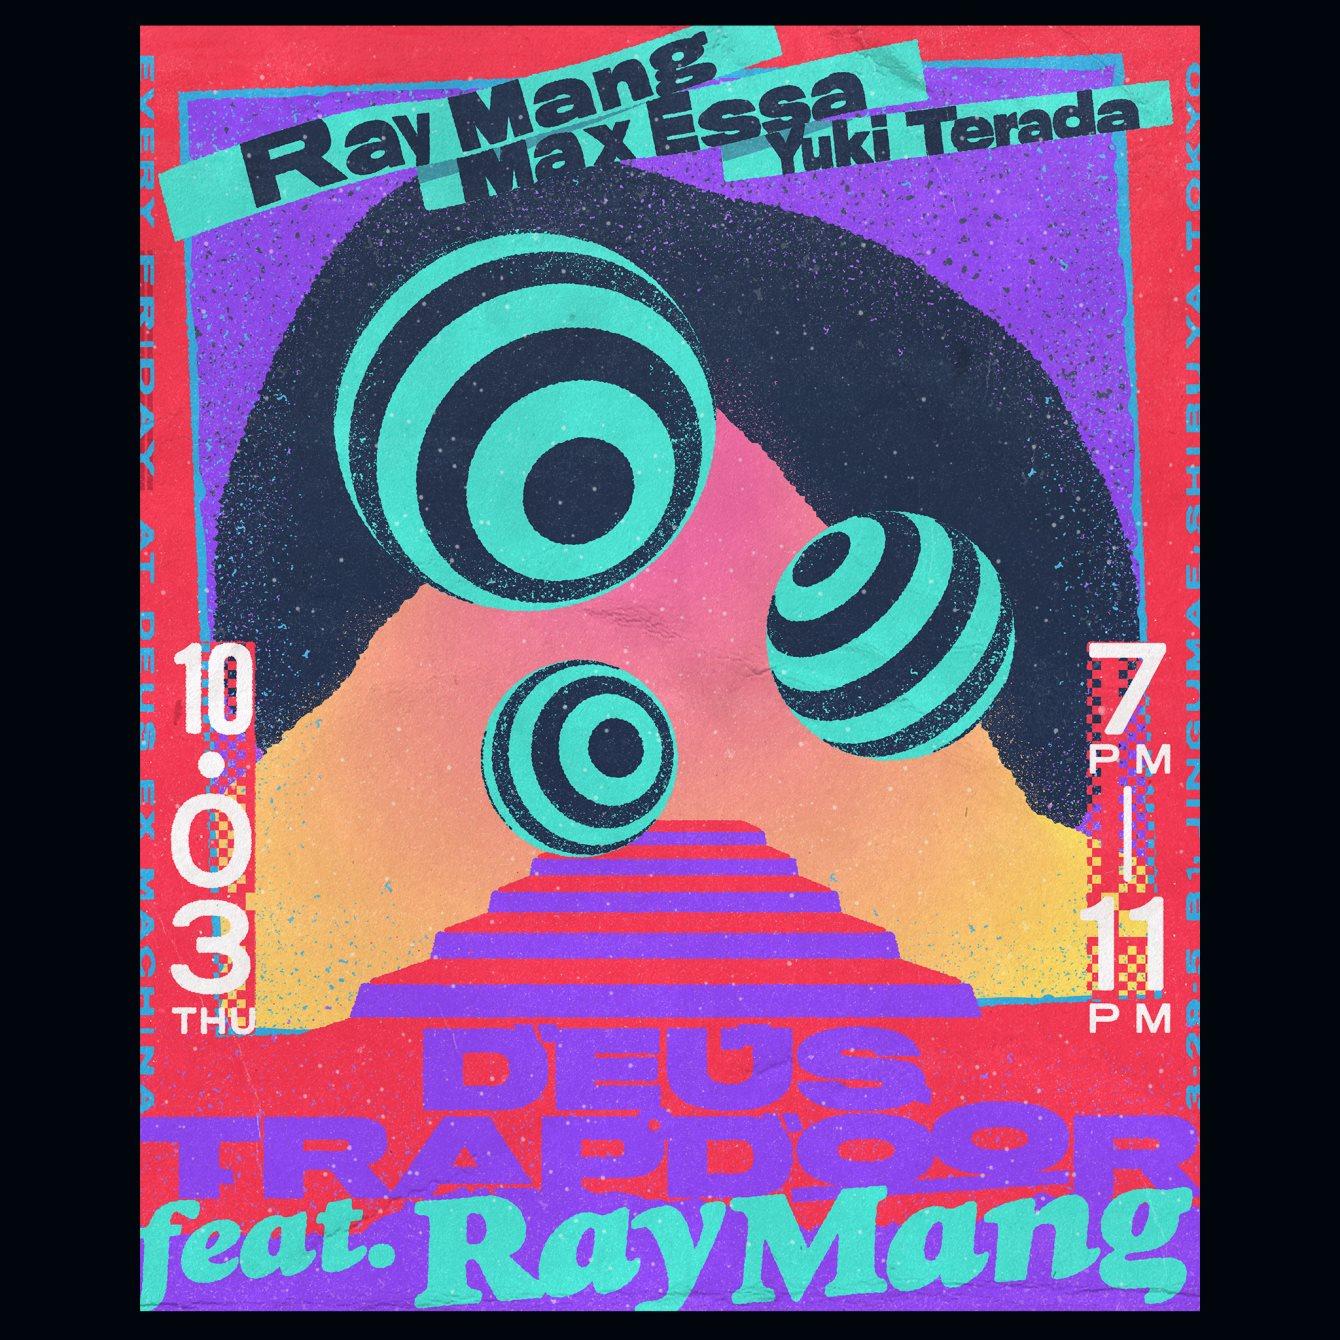 Deus Trapdoor Feat. Ray Mang - Flyer front